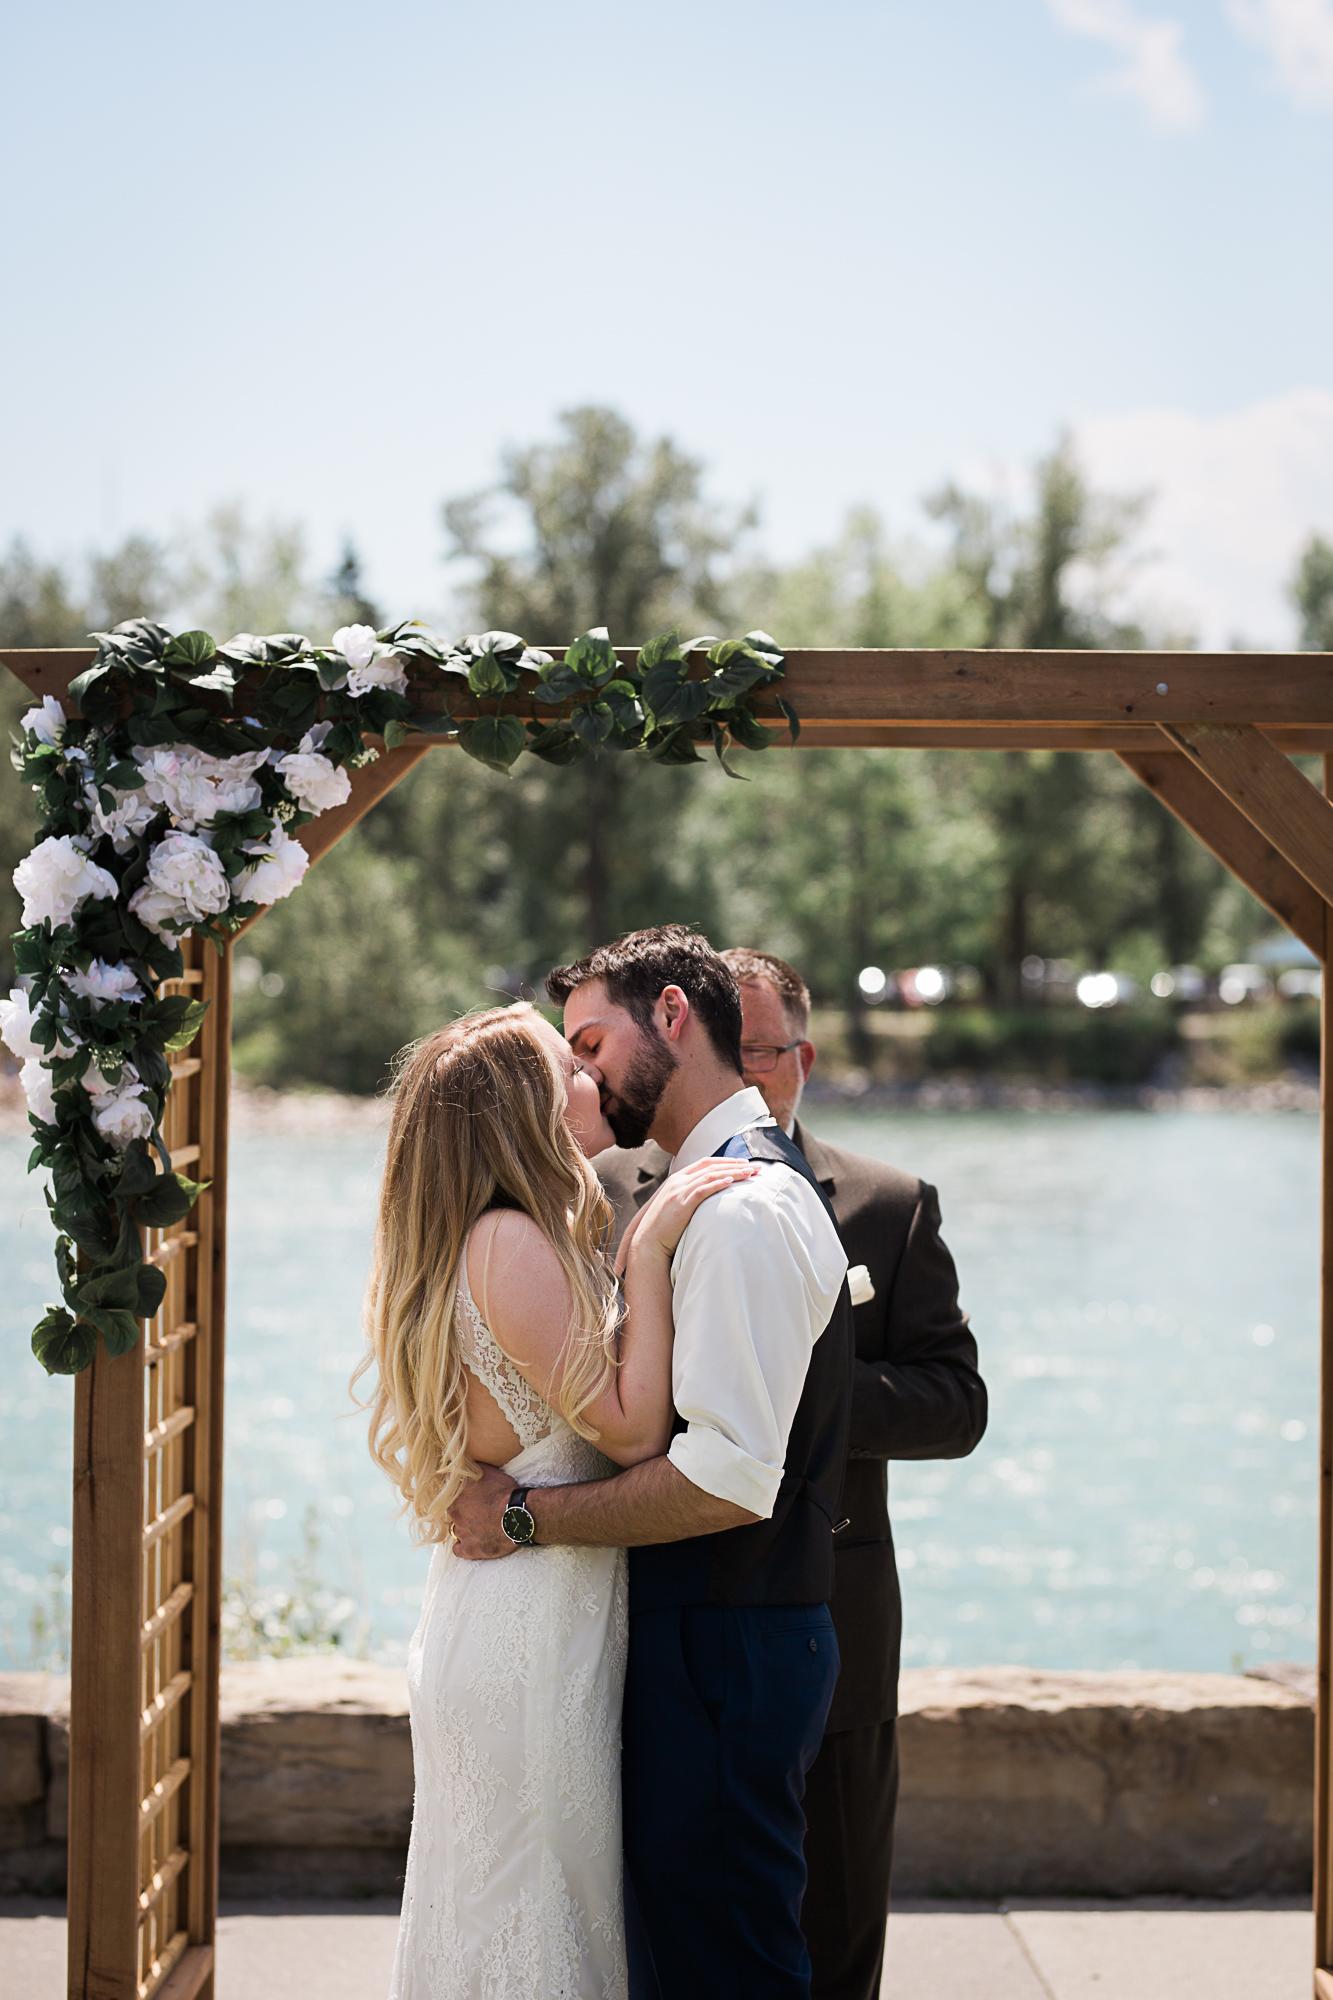 Baker-park-wedding-AC-37.jpg